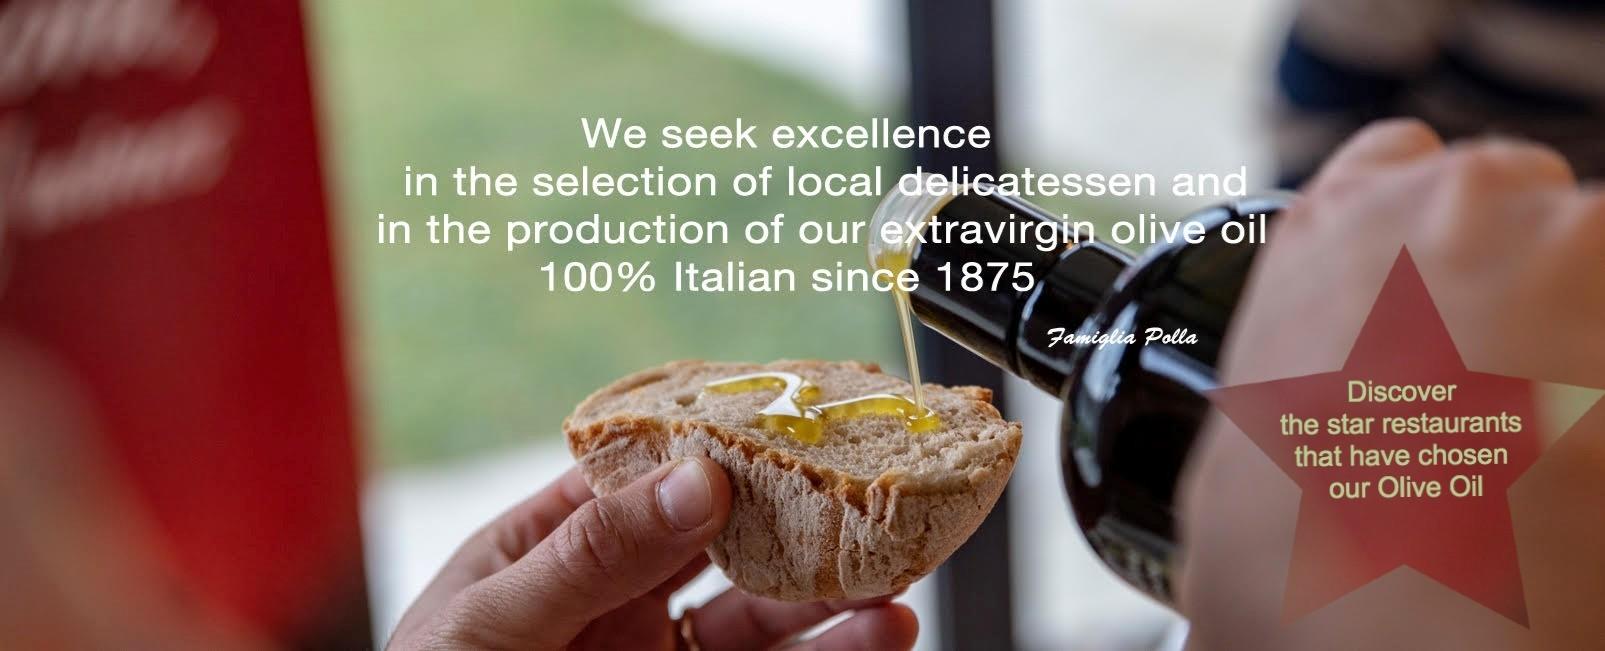 Extravirgin Olive Oil Taggiasco - 100% Italian - Polla since 1875